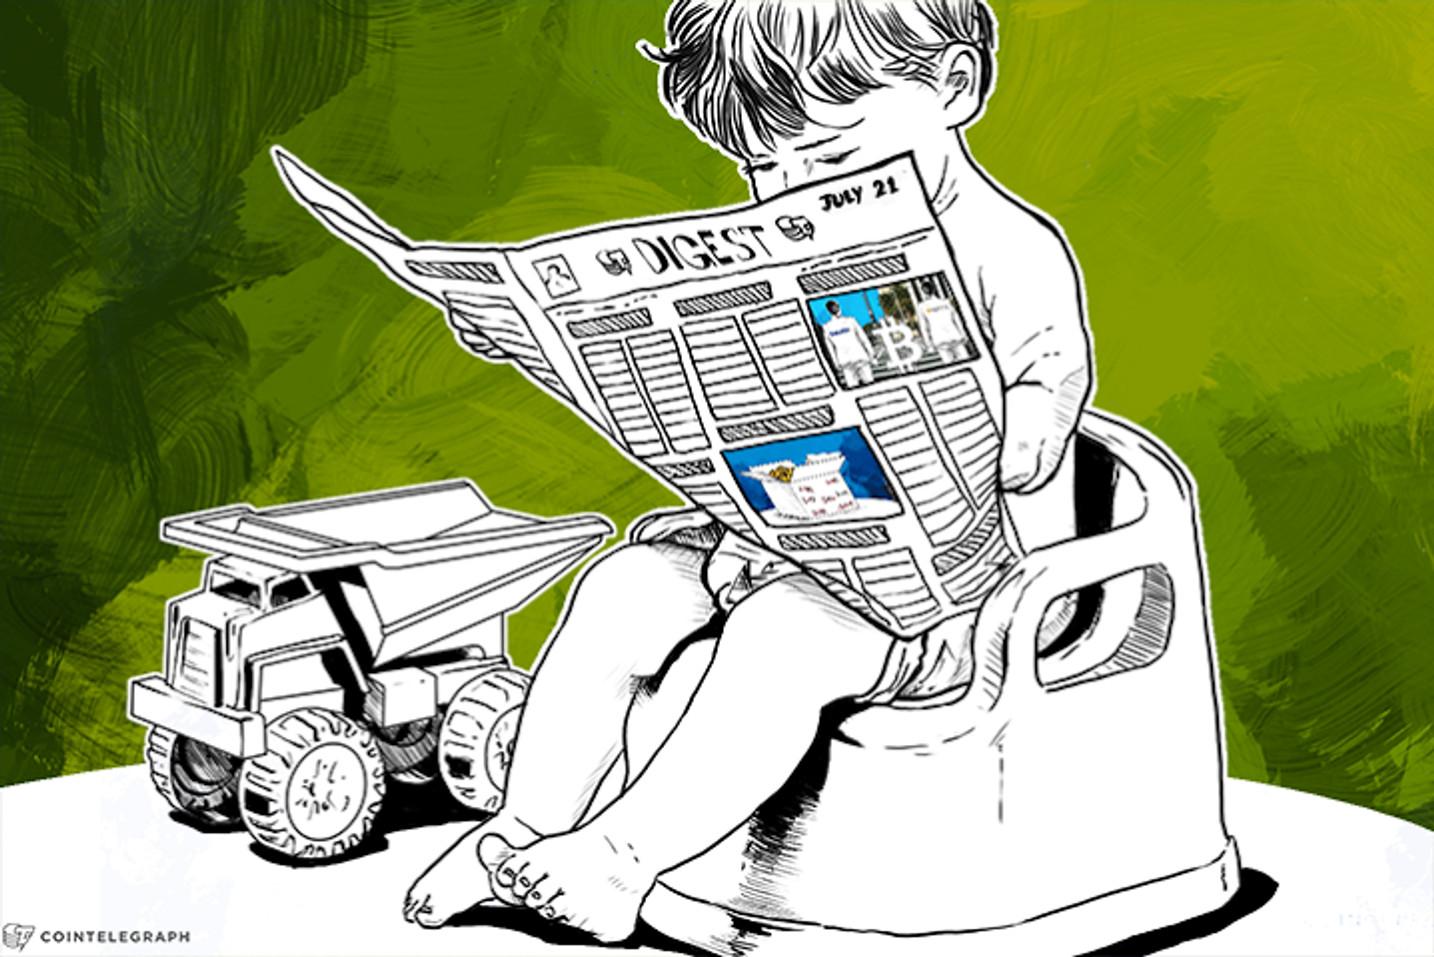 JUL 21 DIGEST: BitX Raises US$4M from Africa's Largest Firm; OpenBazaar Prepares for November Launch